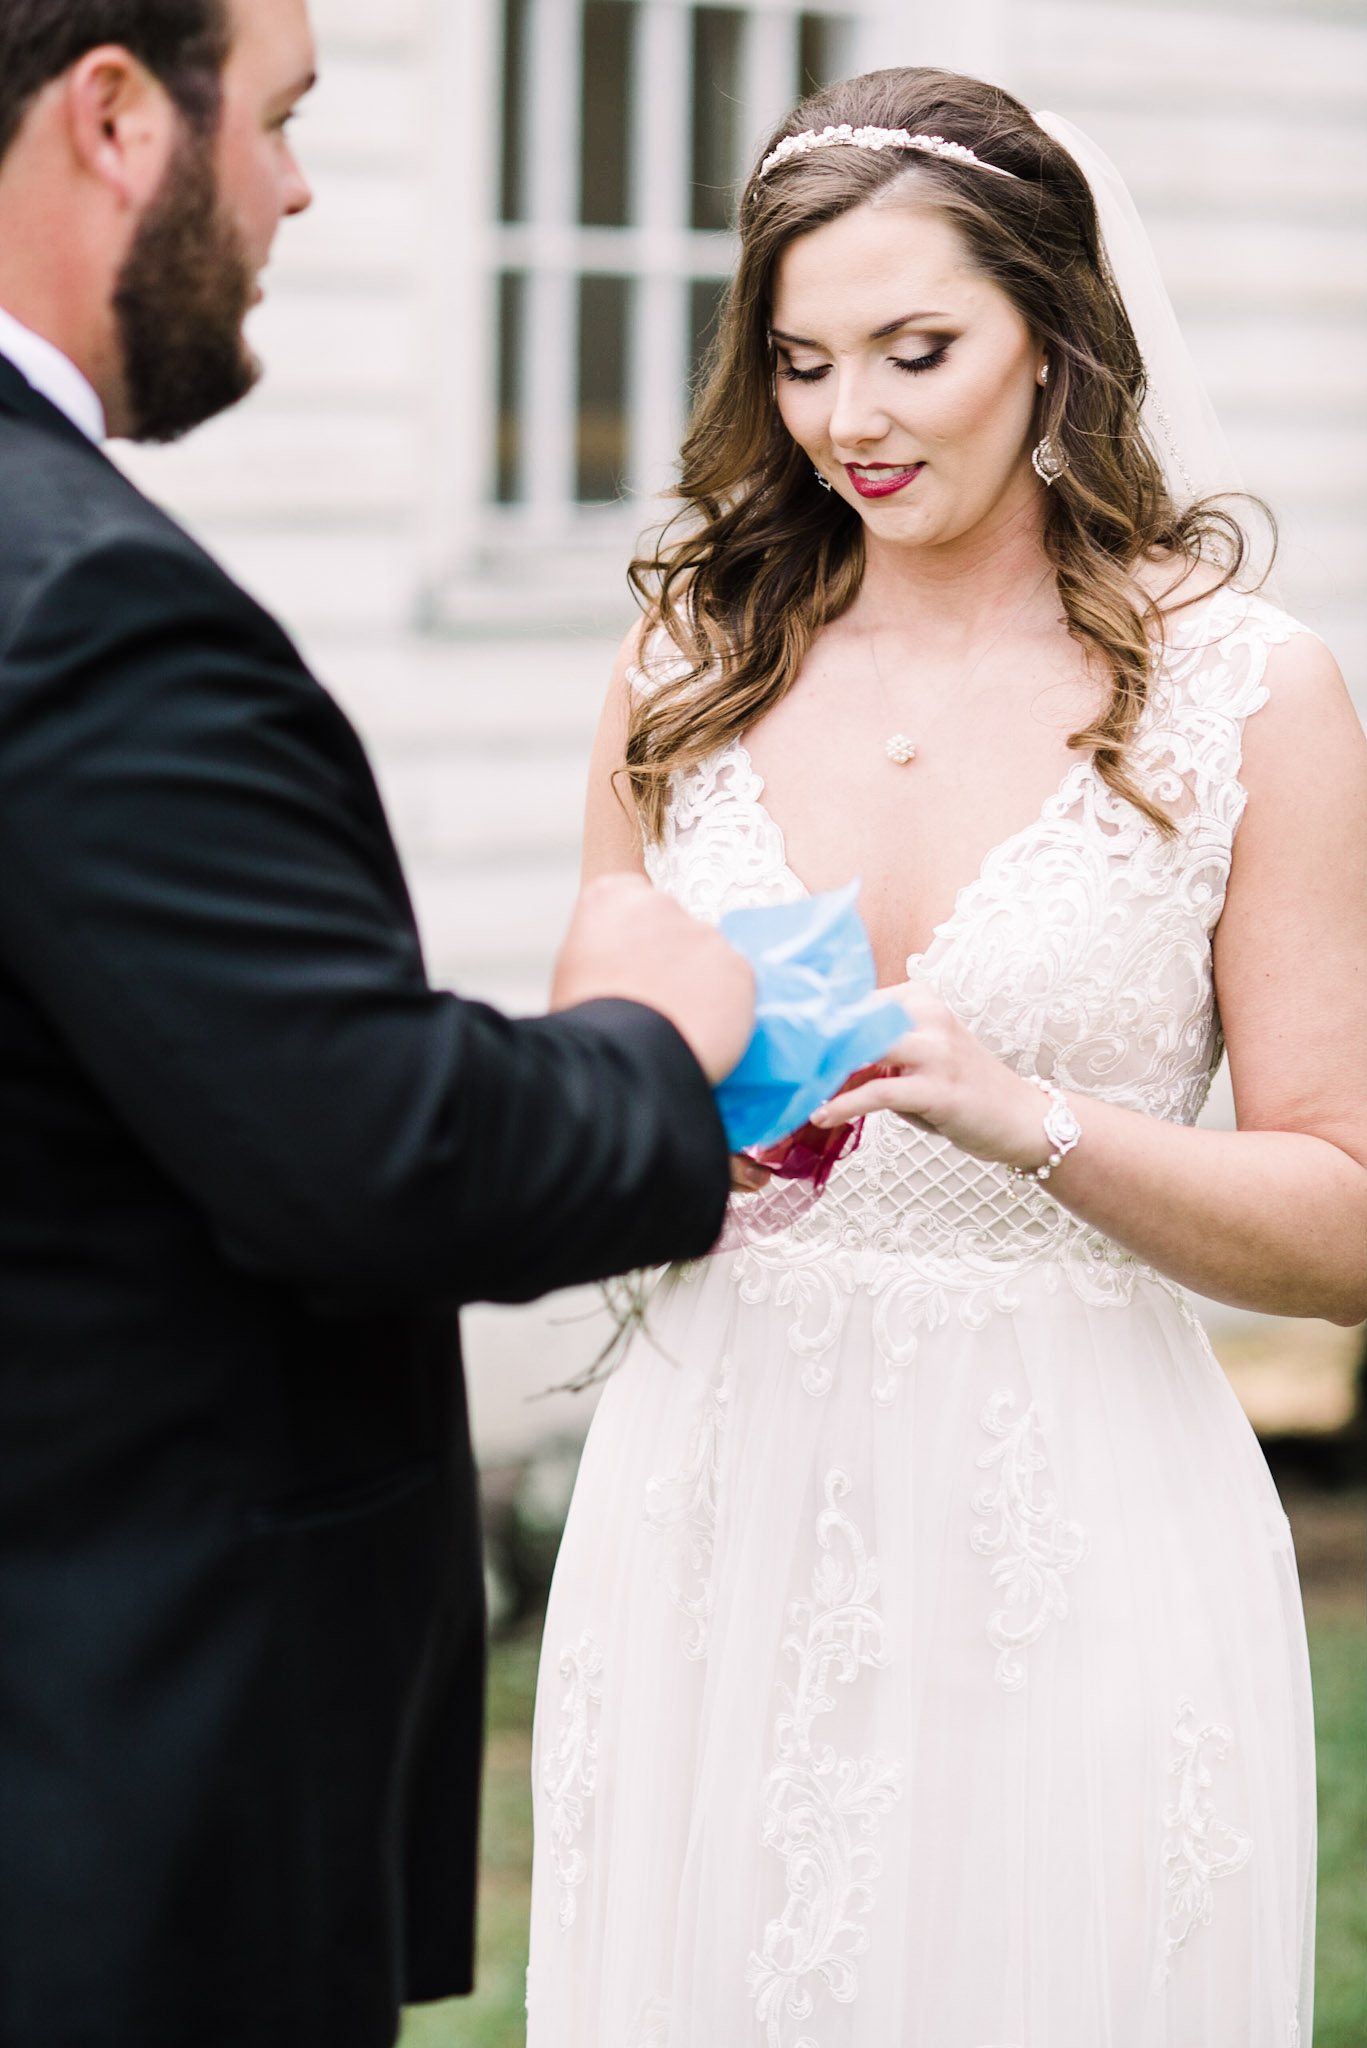 Jas_Natalie_Foxworth_Wedding_2018-7.jpg